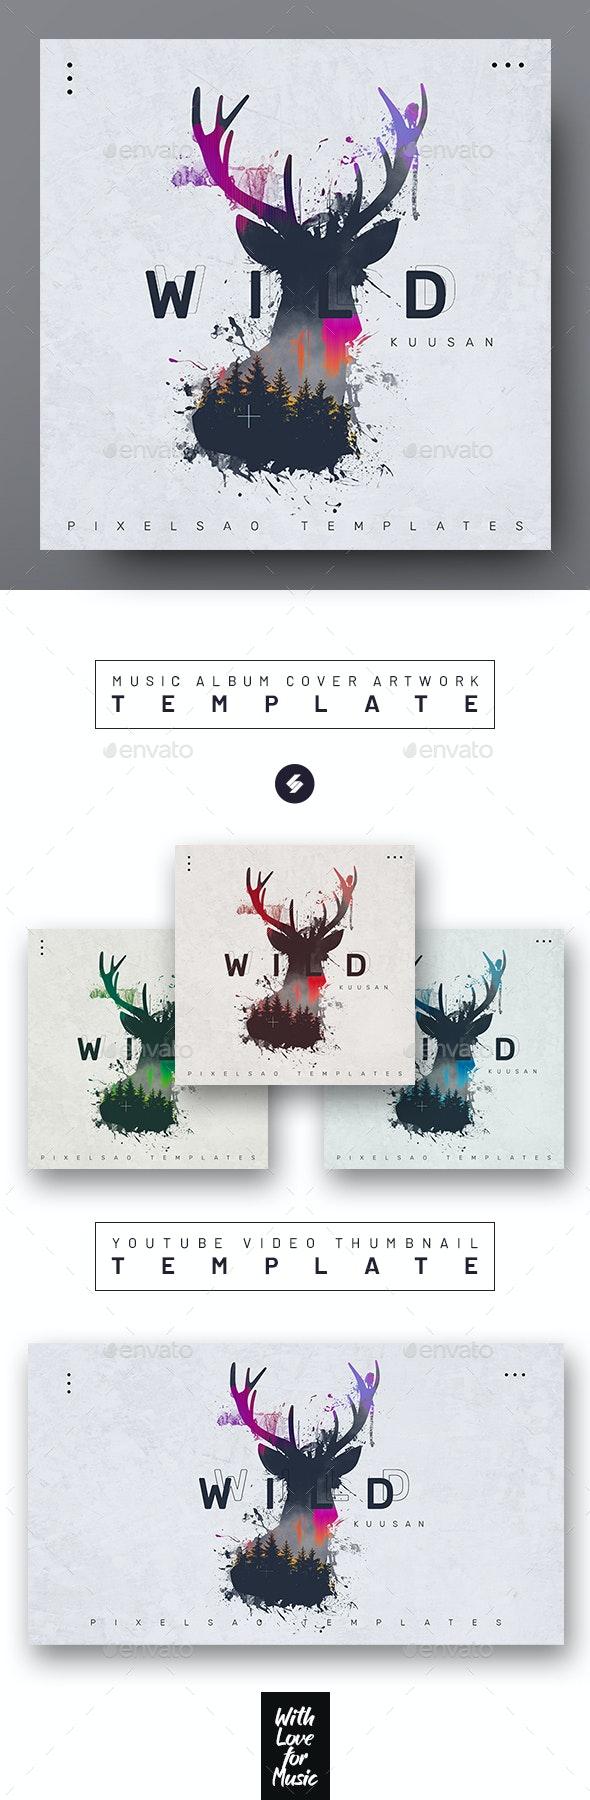 Wild – Music Album Cover Artwork Template - Miscellaneous Social Media